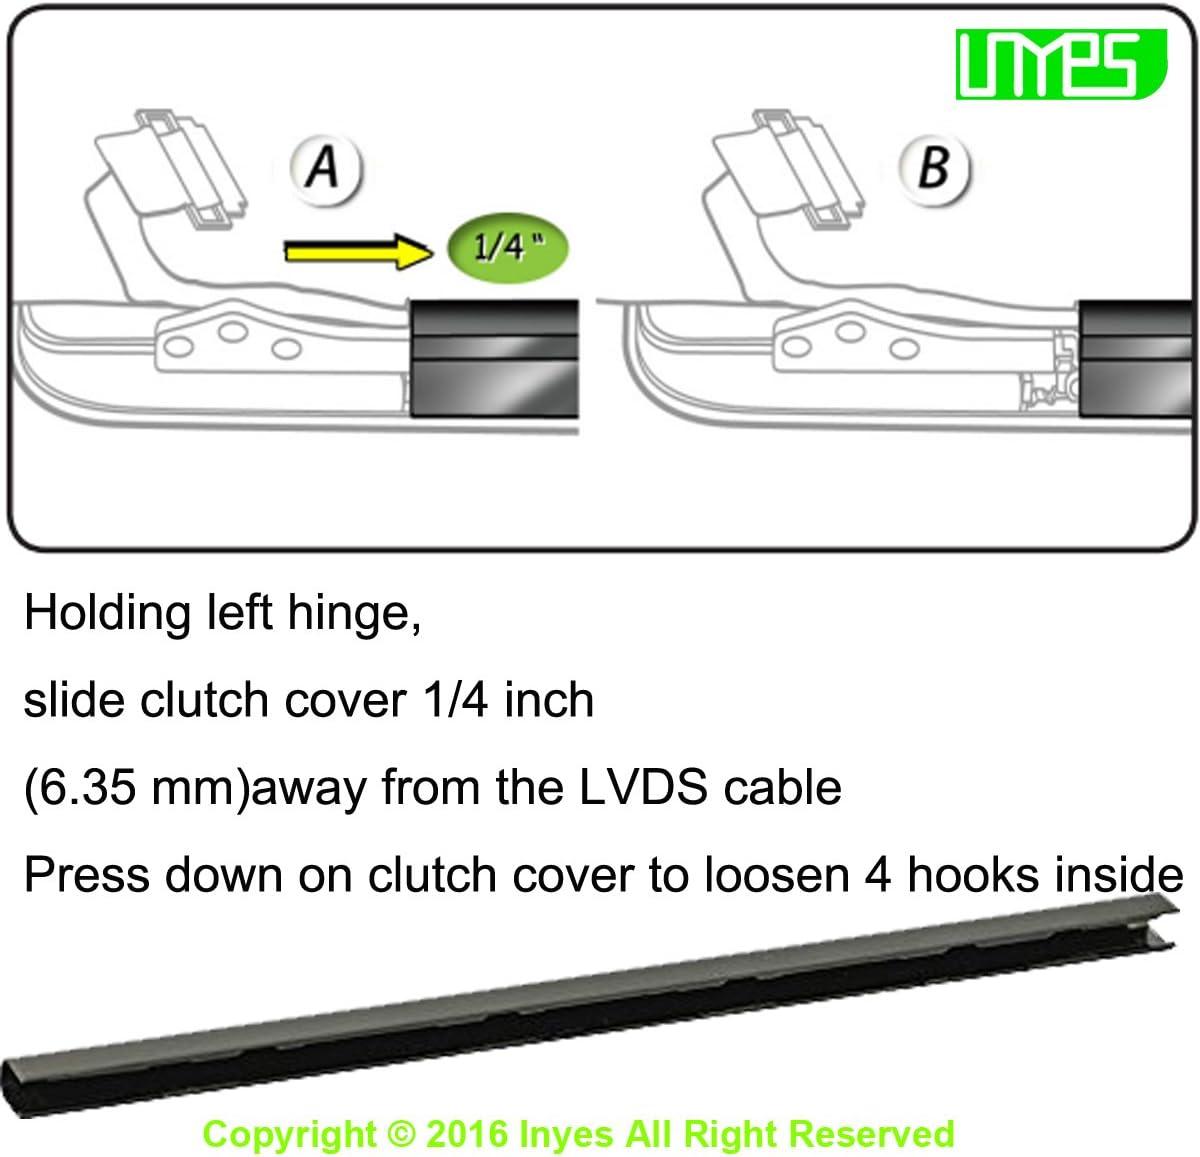 NEW Hinge Clutch Cover for Macbook Pro Unibody A1278 13 inch Clutch Shaft Cap